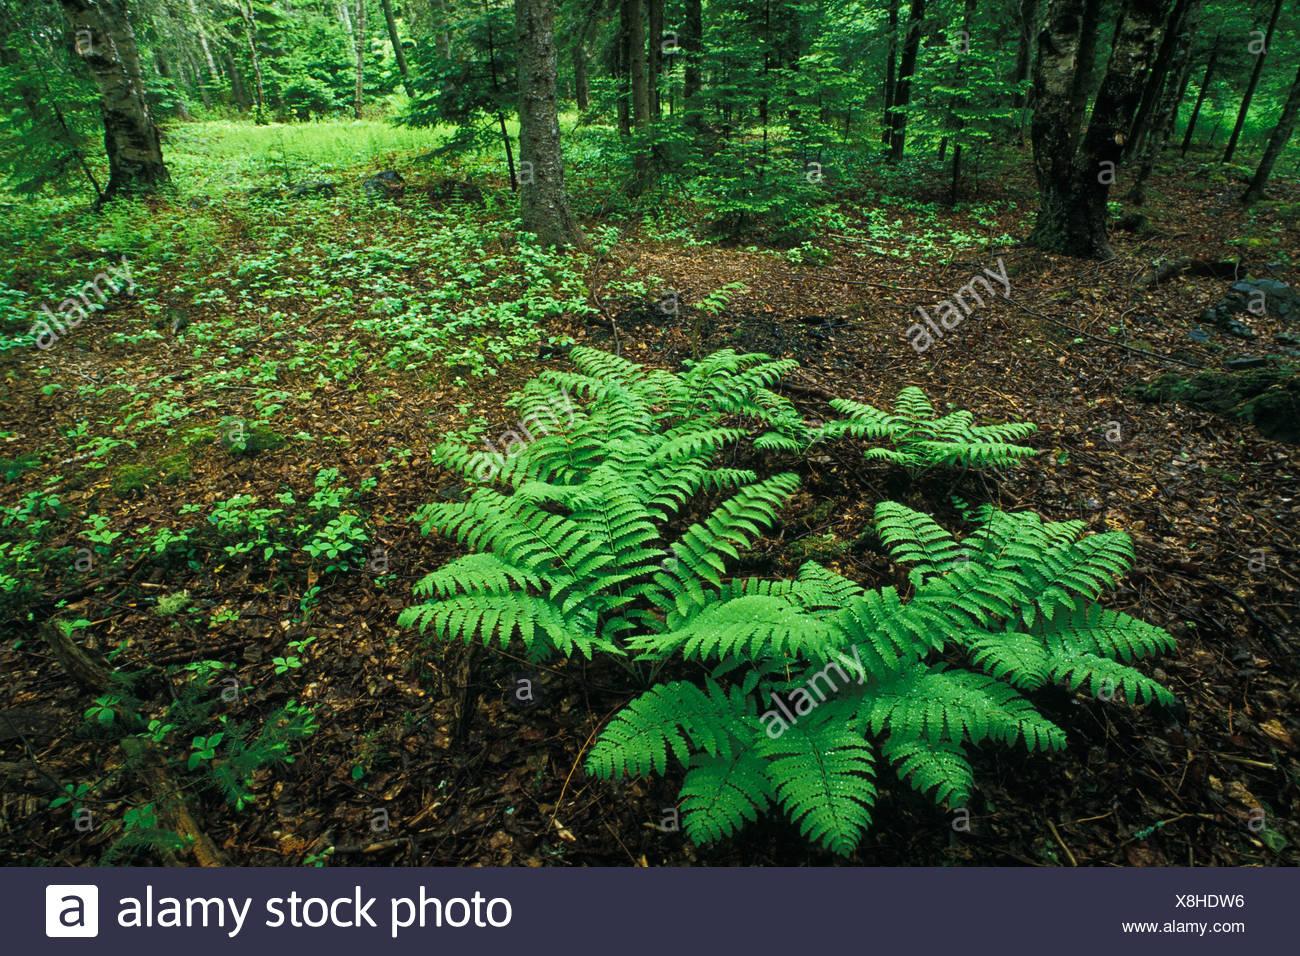 Ferns in spring woodland floor, Kingston, New Brunswick, Canada Stock Photo